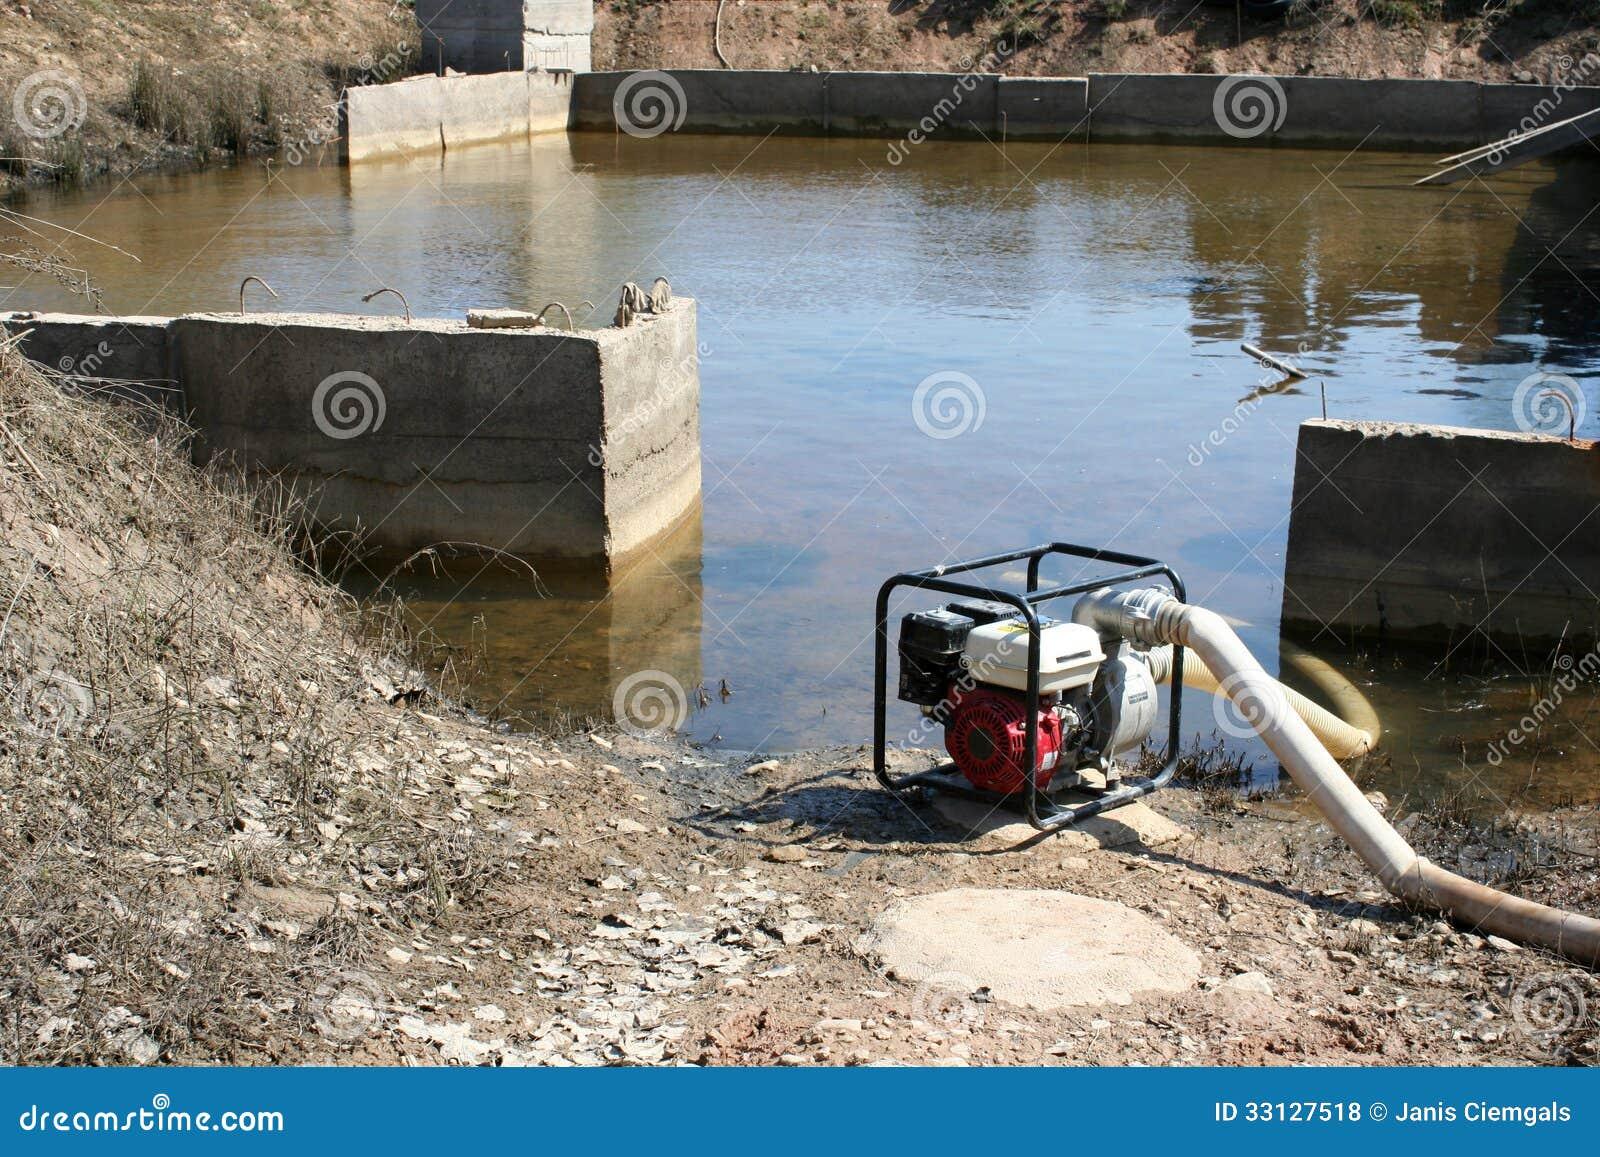 pumping water basement stock photo image of waterpump 33127518 rh dreamstime com water pump basement water pump basement floor